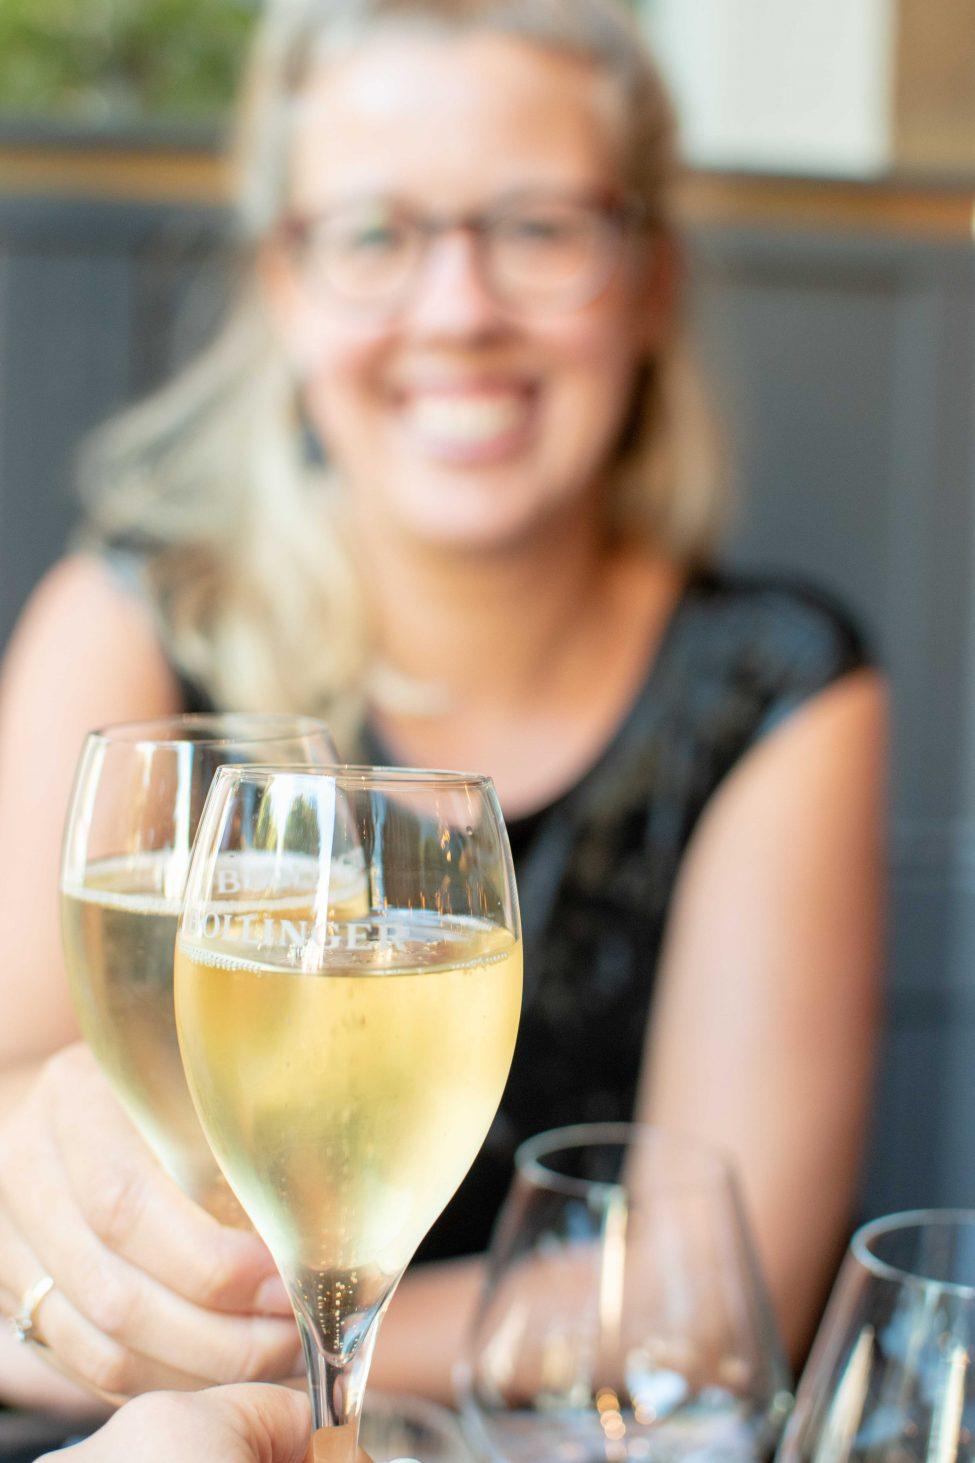 Oesters en champagne op vrijdag bij Café Americain